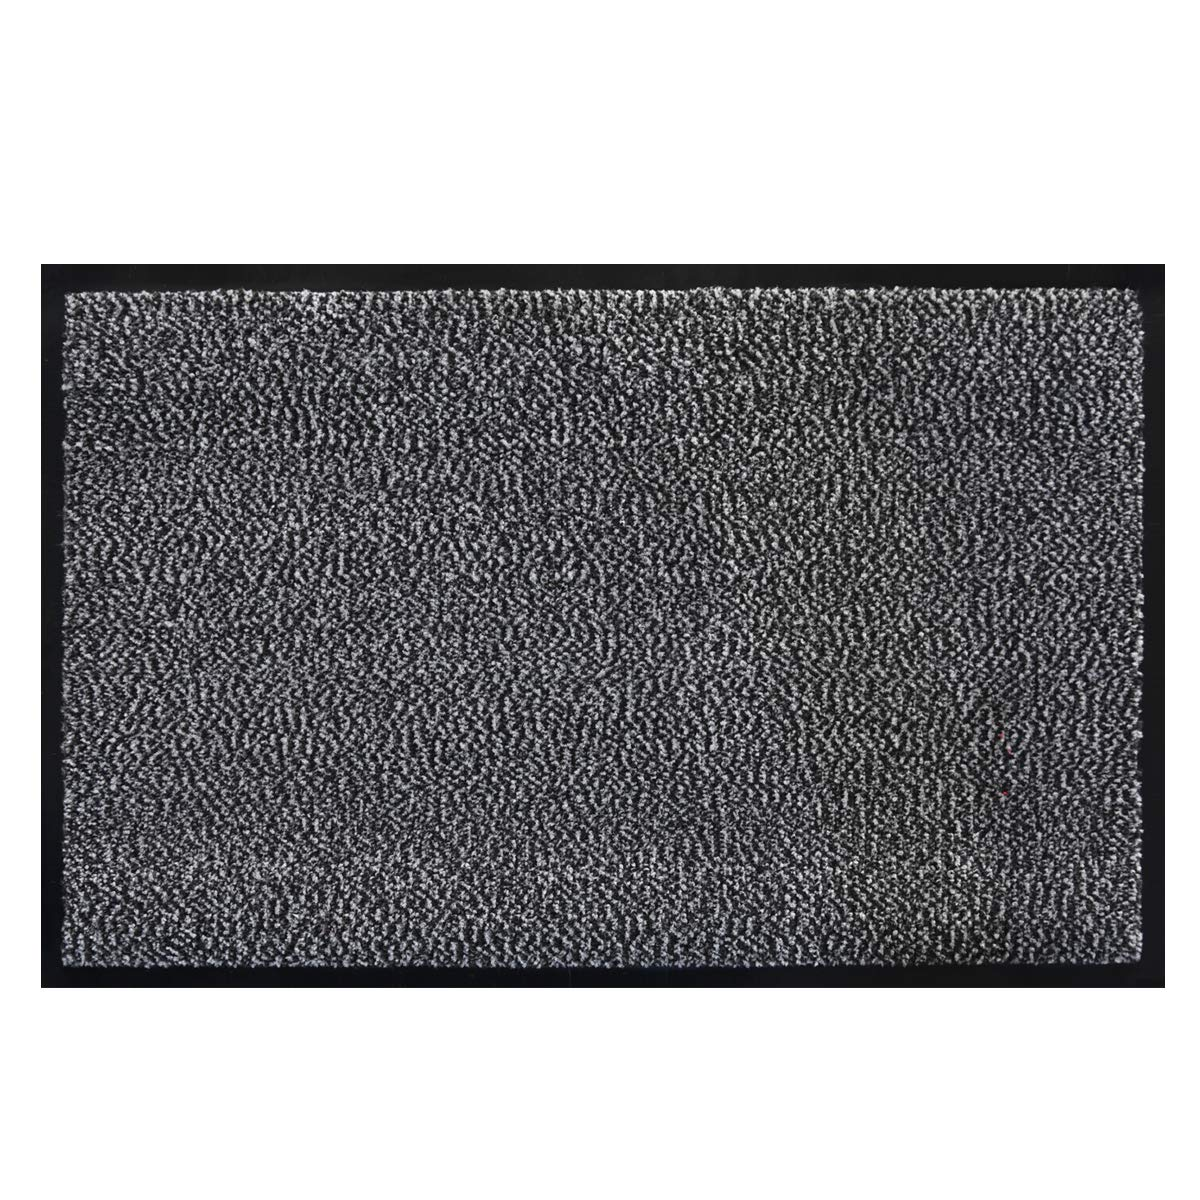 Showin Carpet Entrance Front Door Mat Absorbent Non Slip